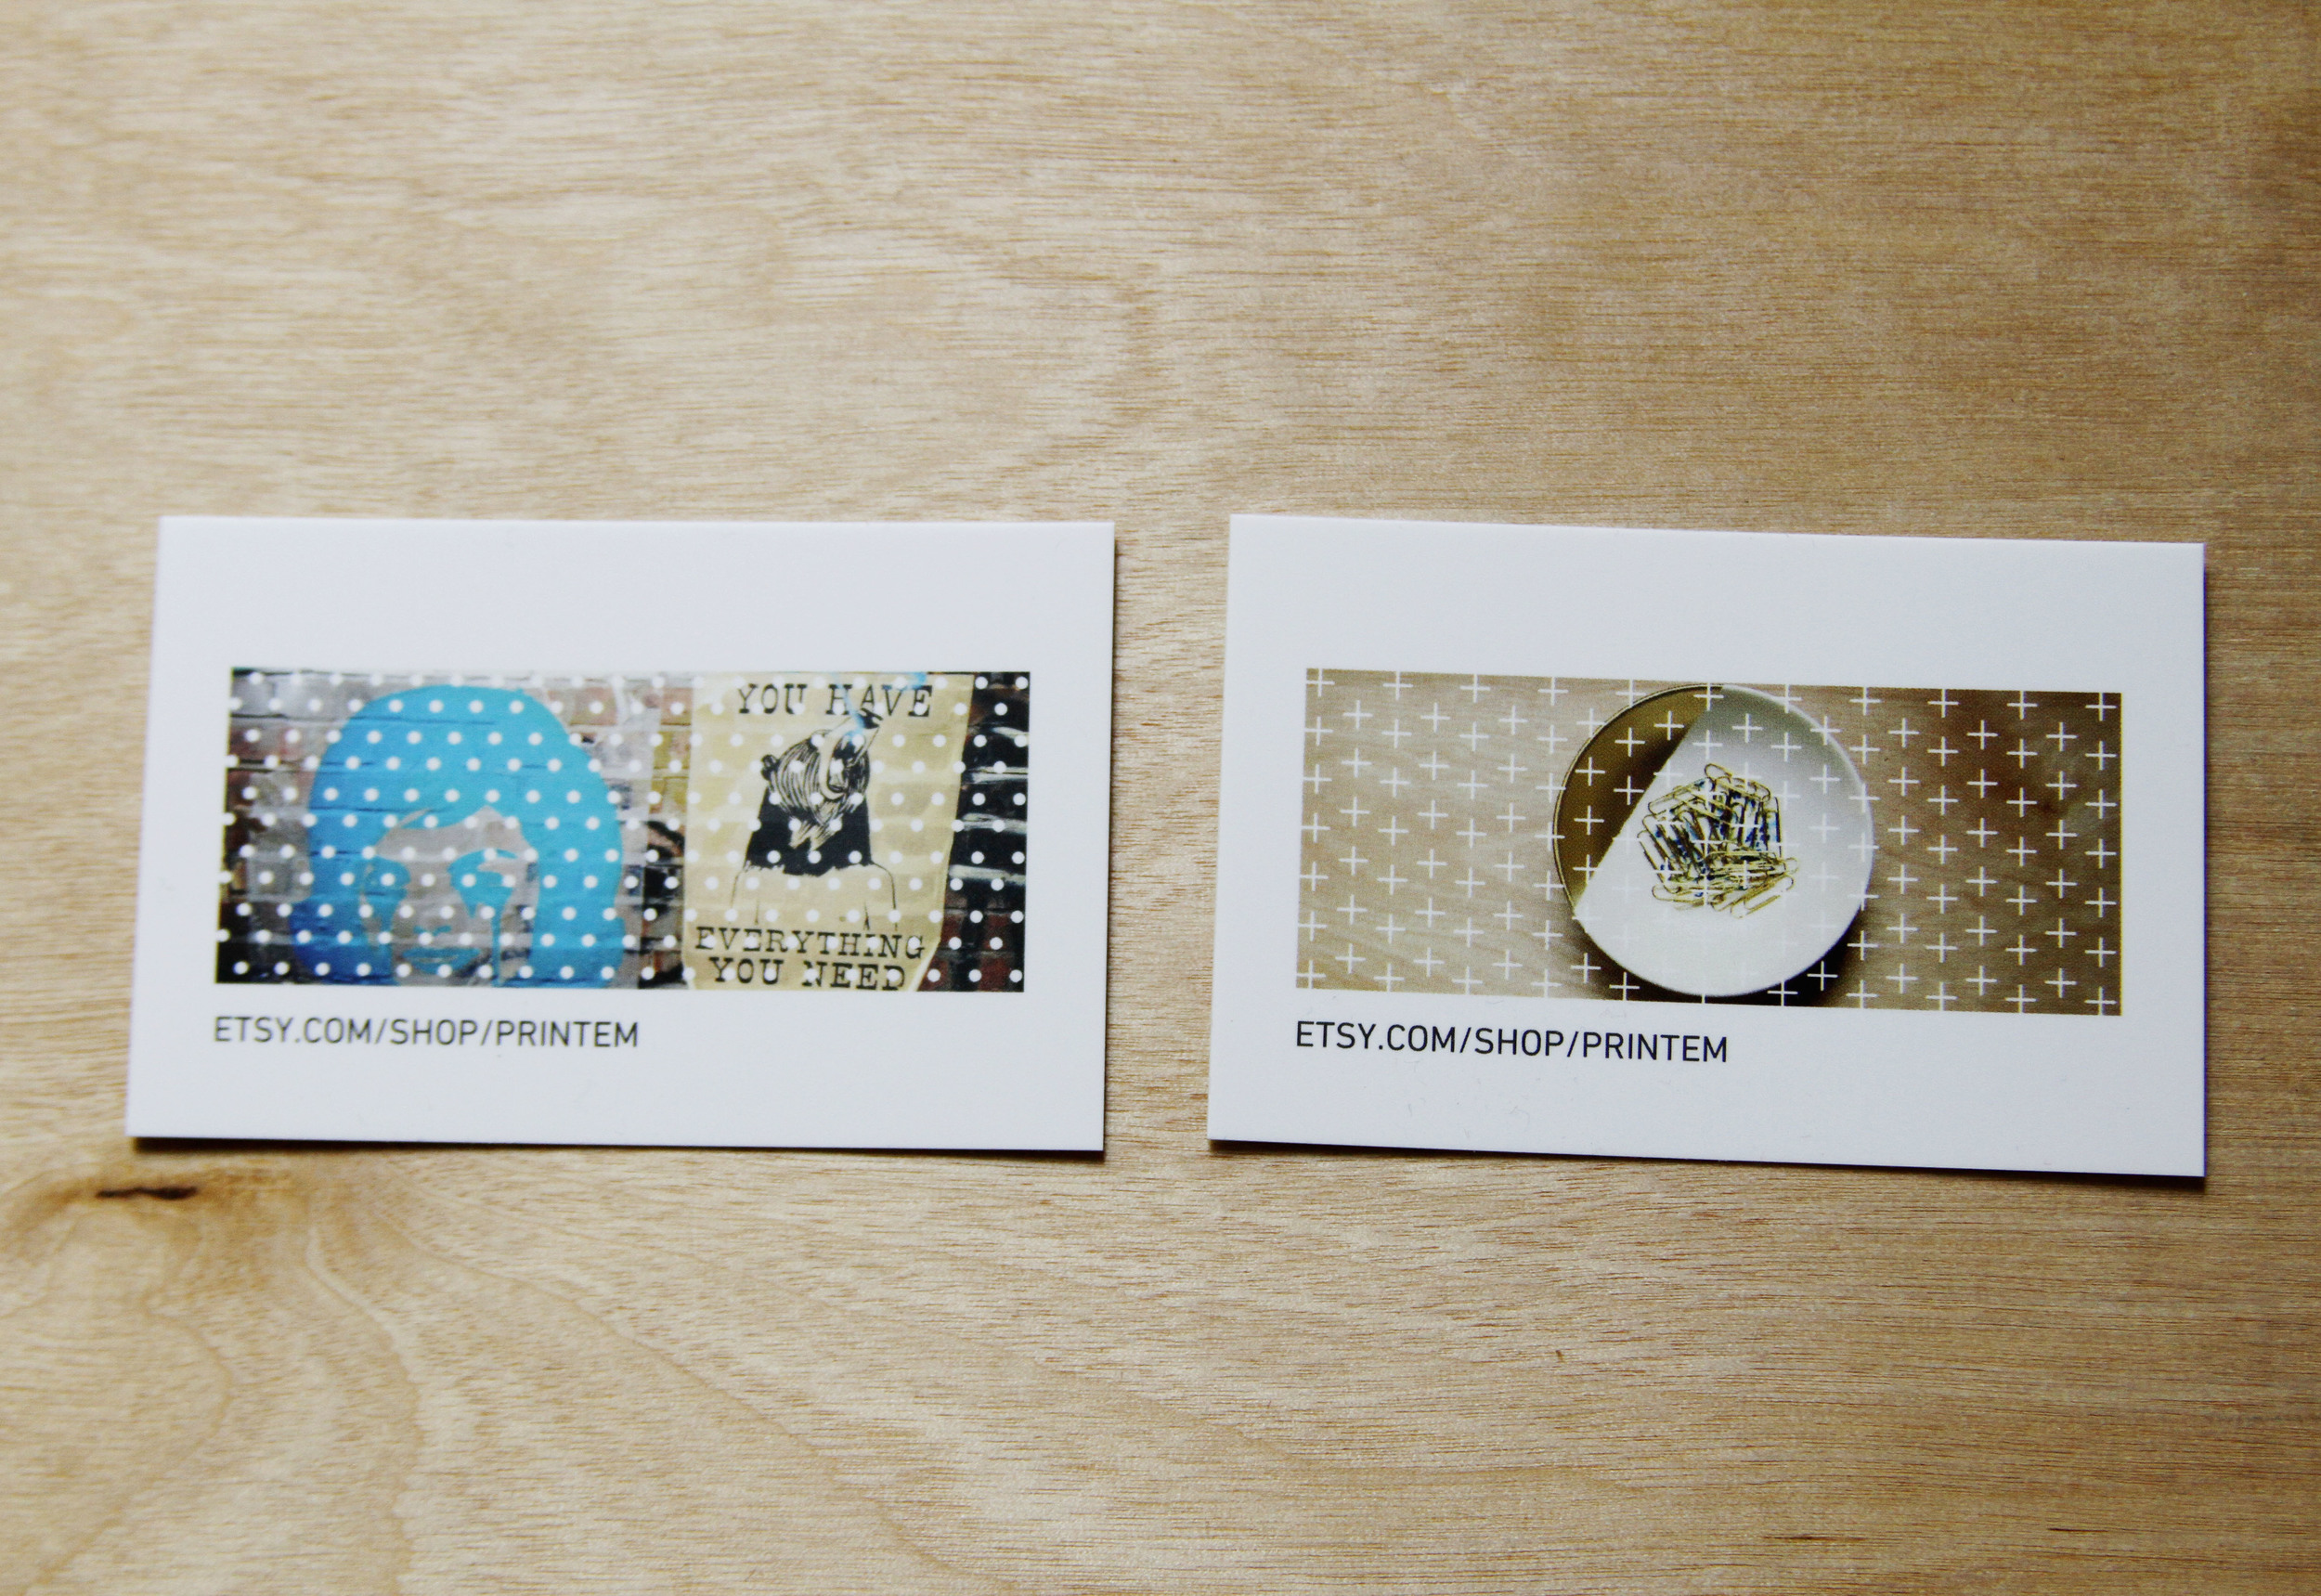 salshutz-business cards